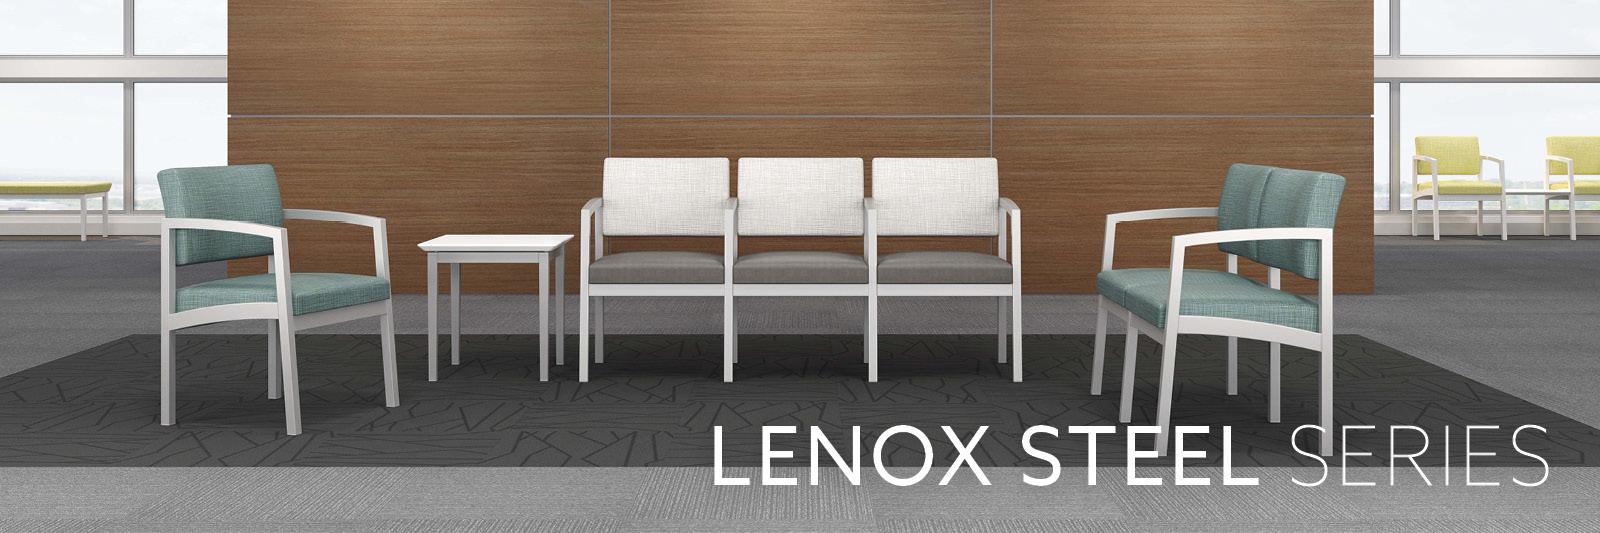 lenox steel